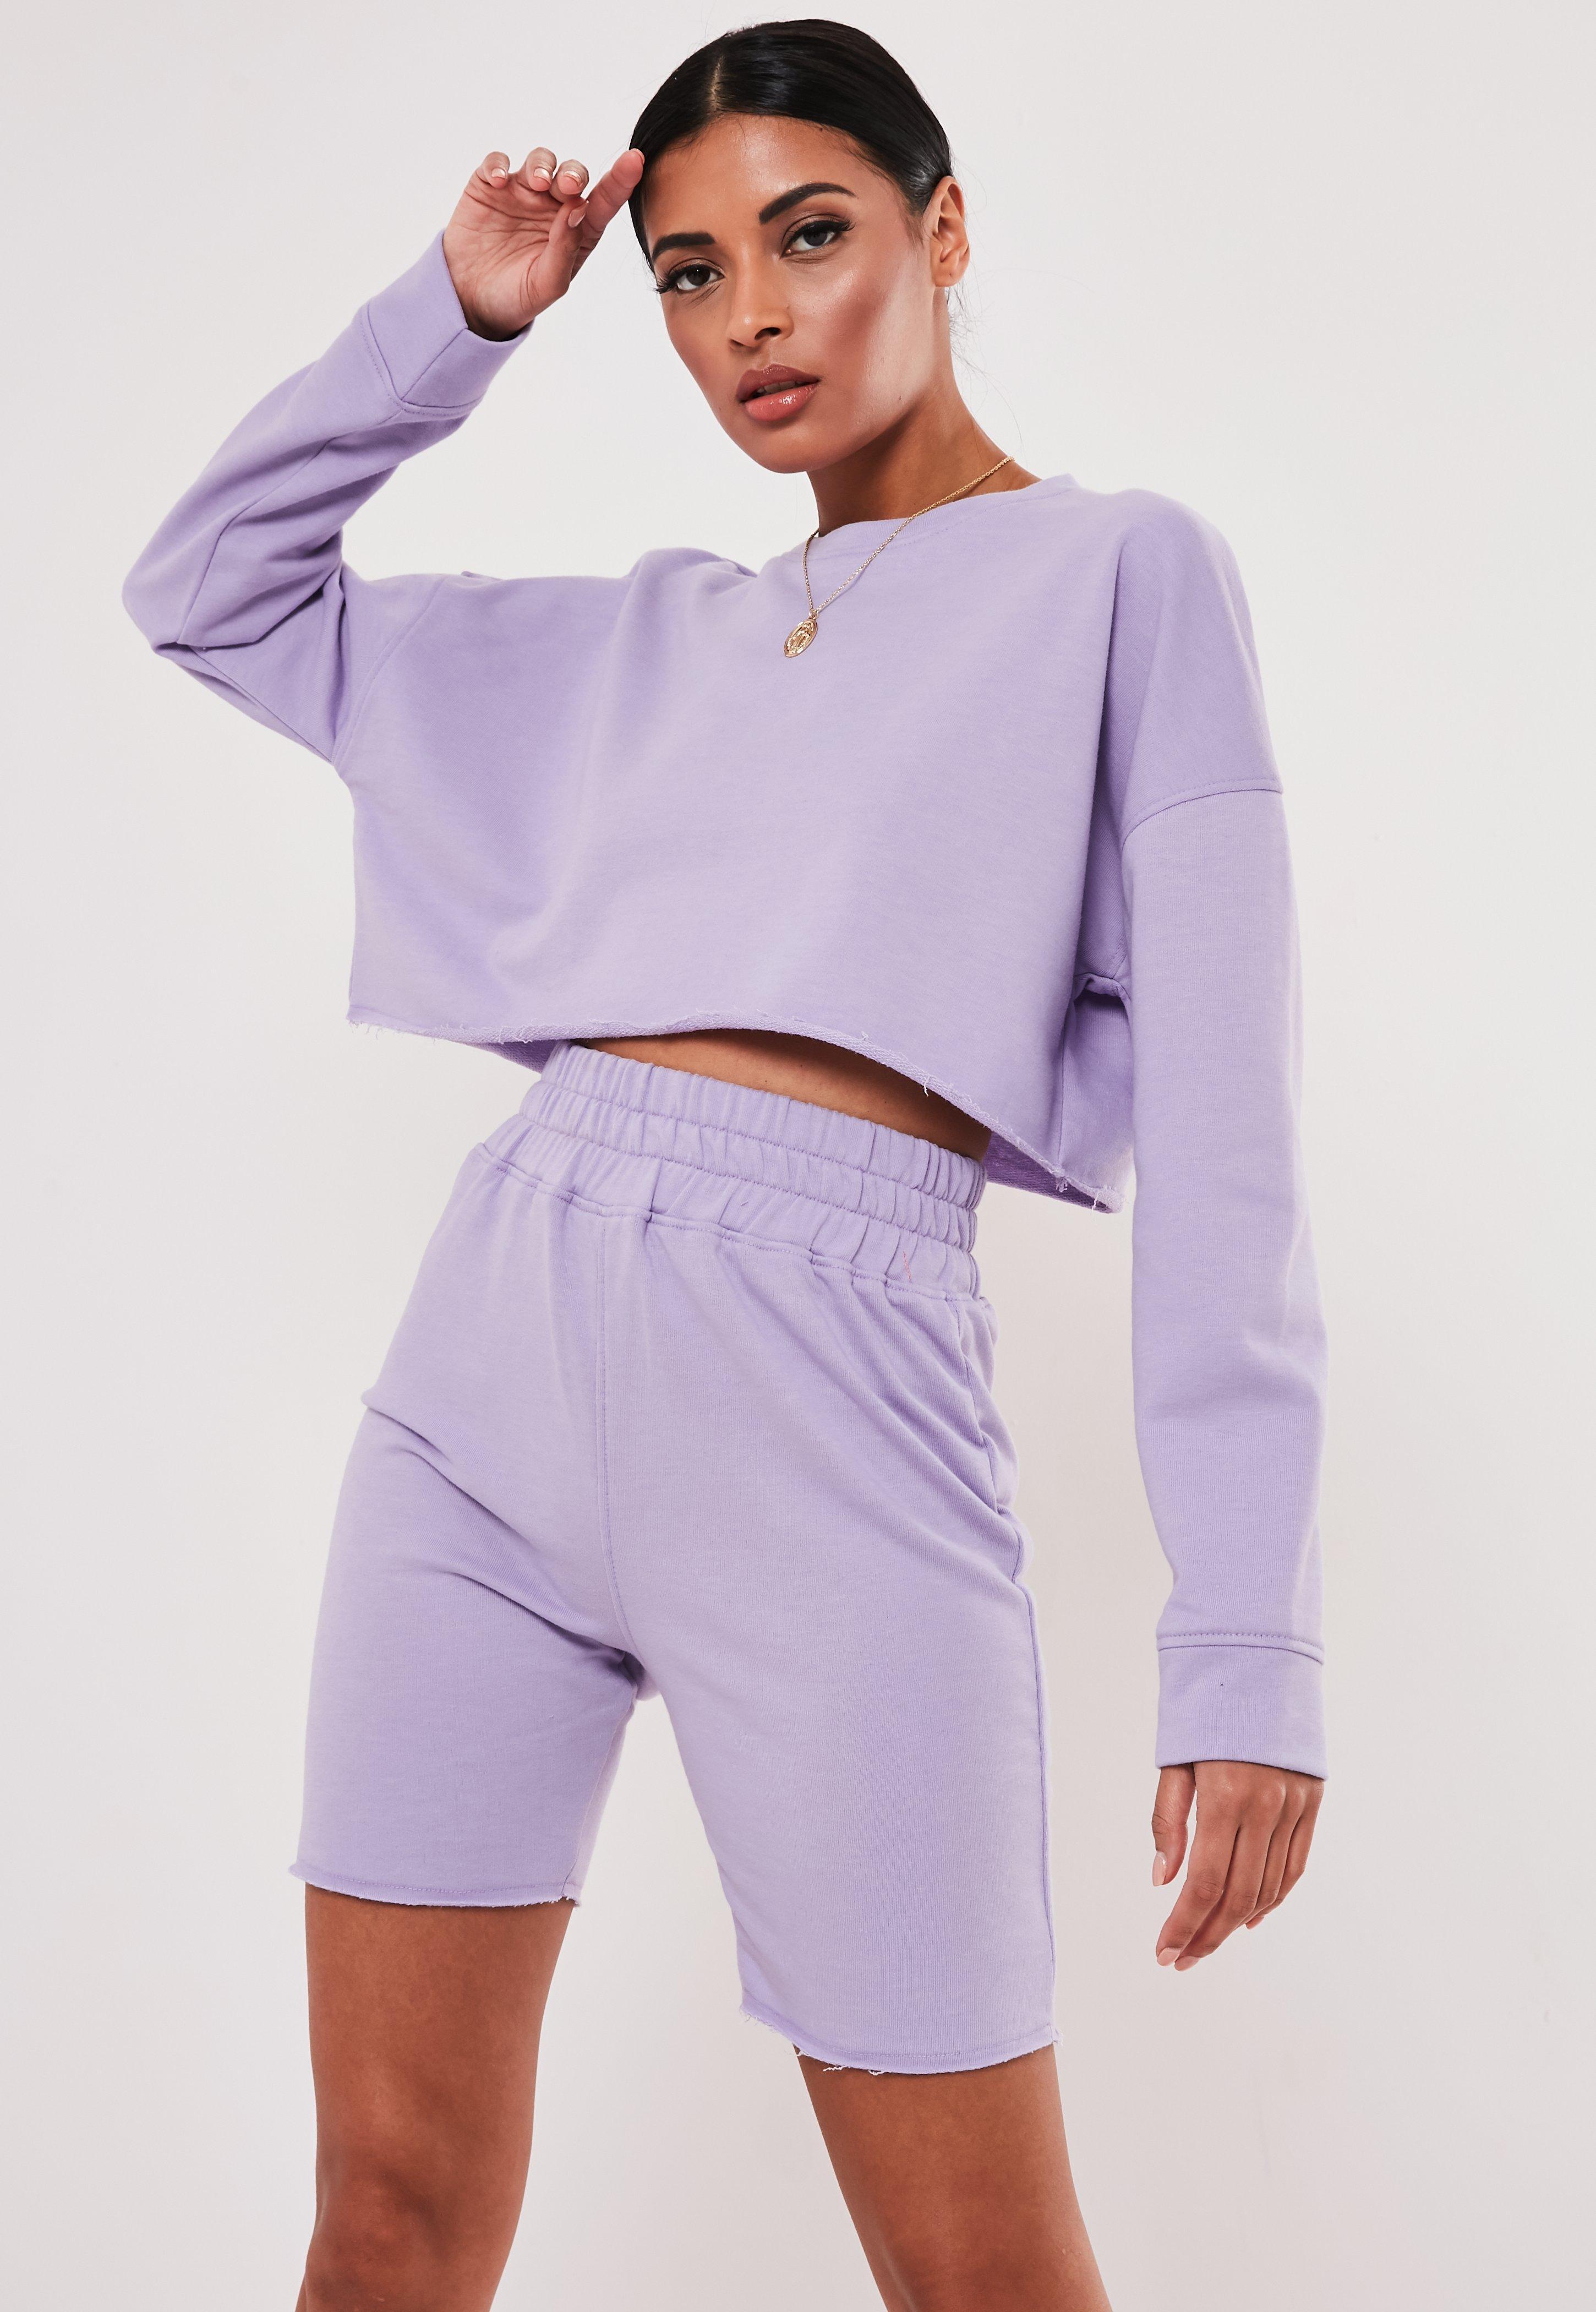 de55bbf3a3 Cycling Shorts | Fashion Cycling Shorts – Missguided